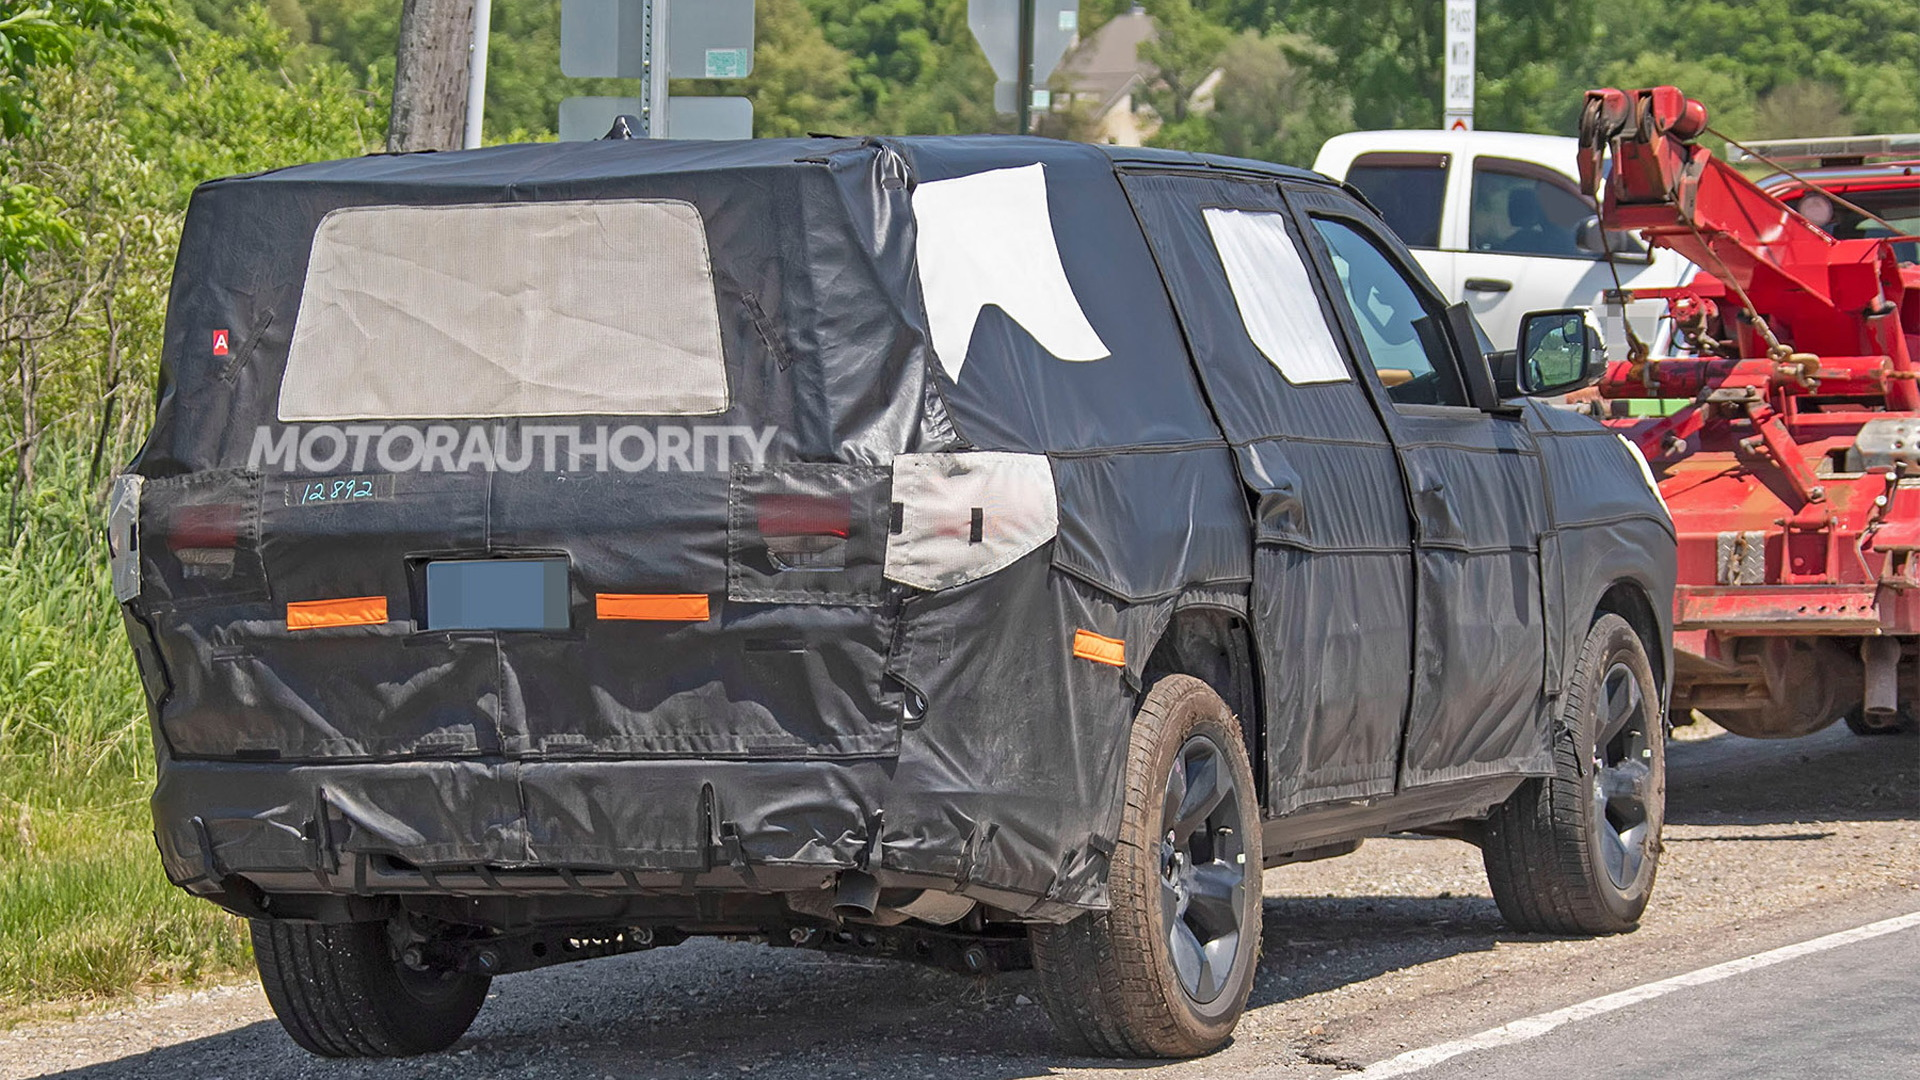 2022 Jeep Wagoneer spy shots - Photo credit:S. Baldauf/SB-Medien